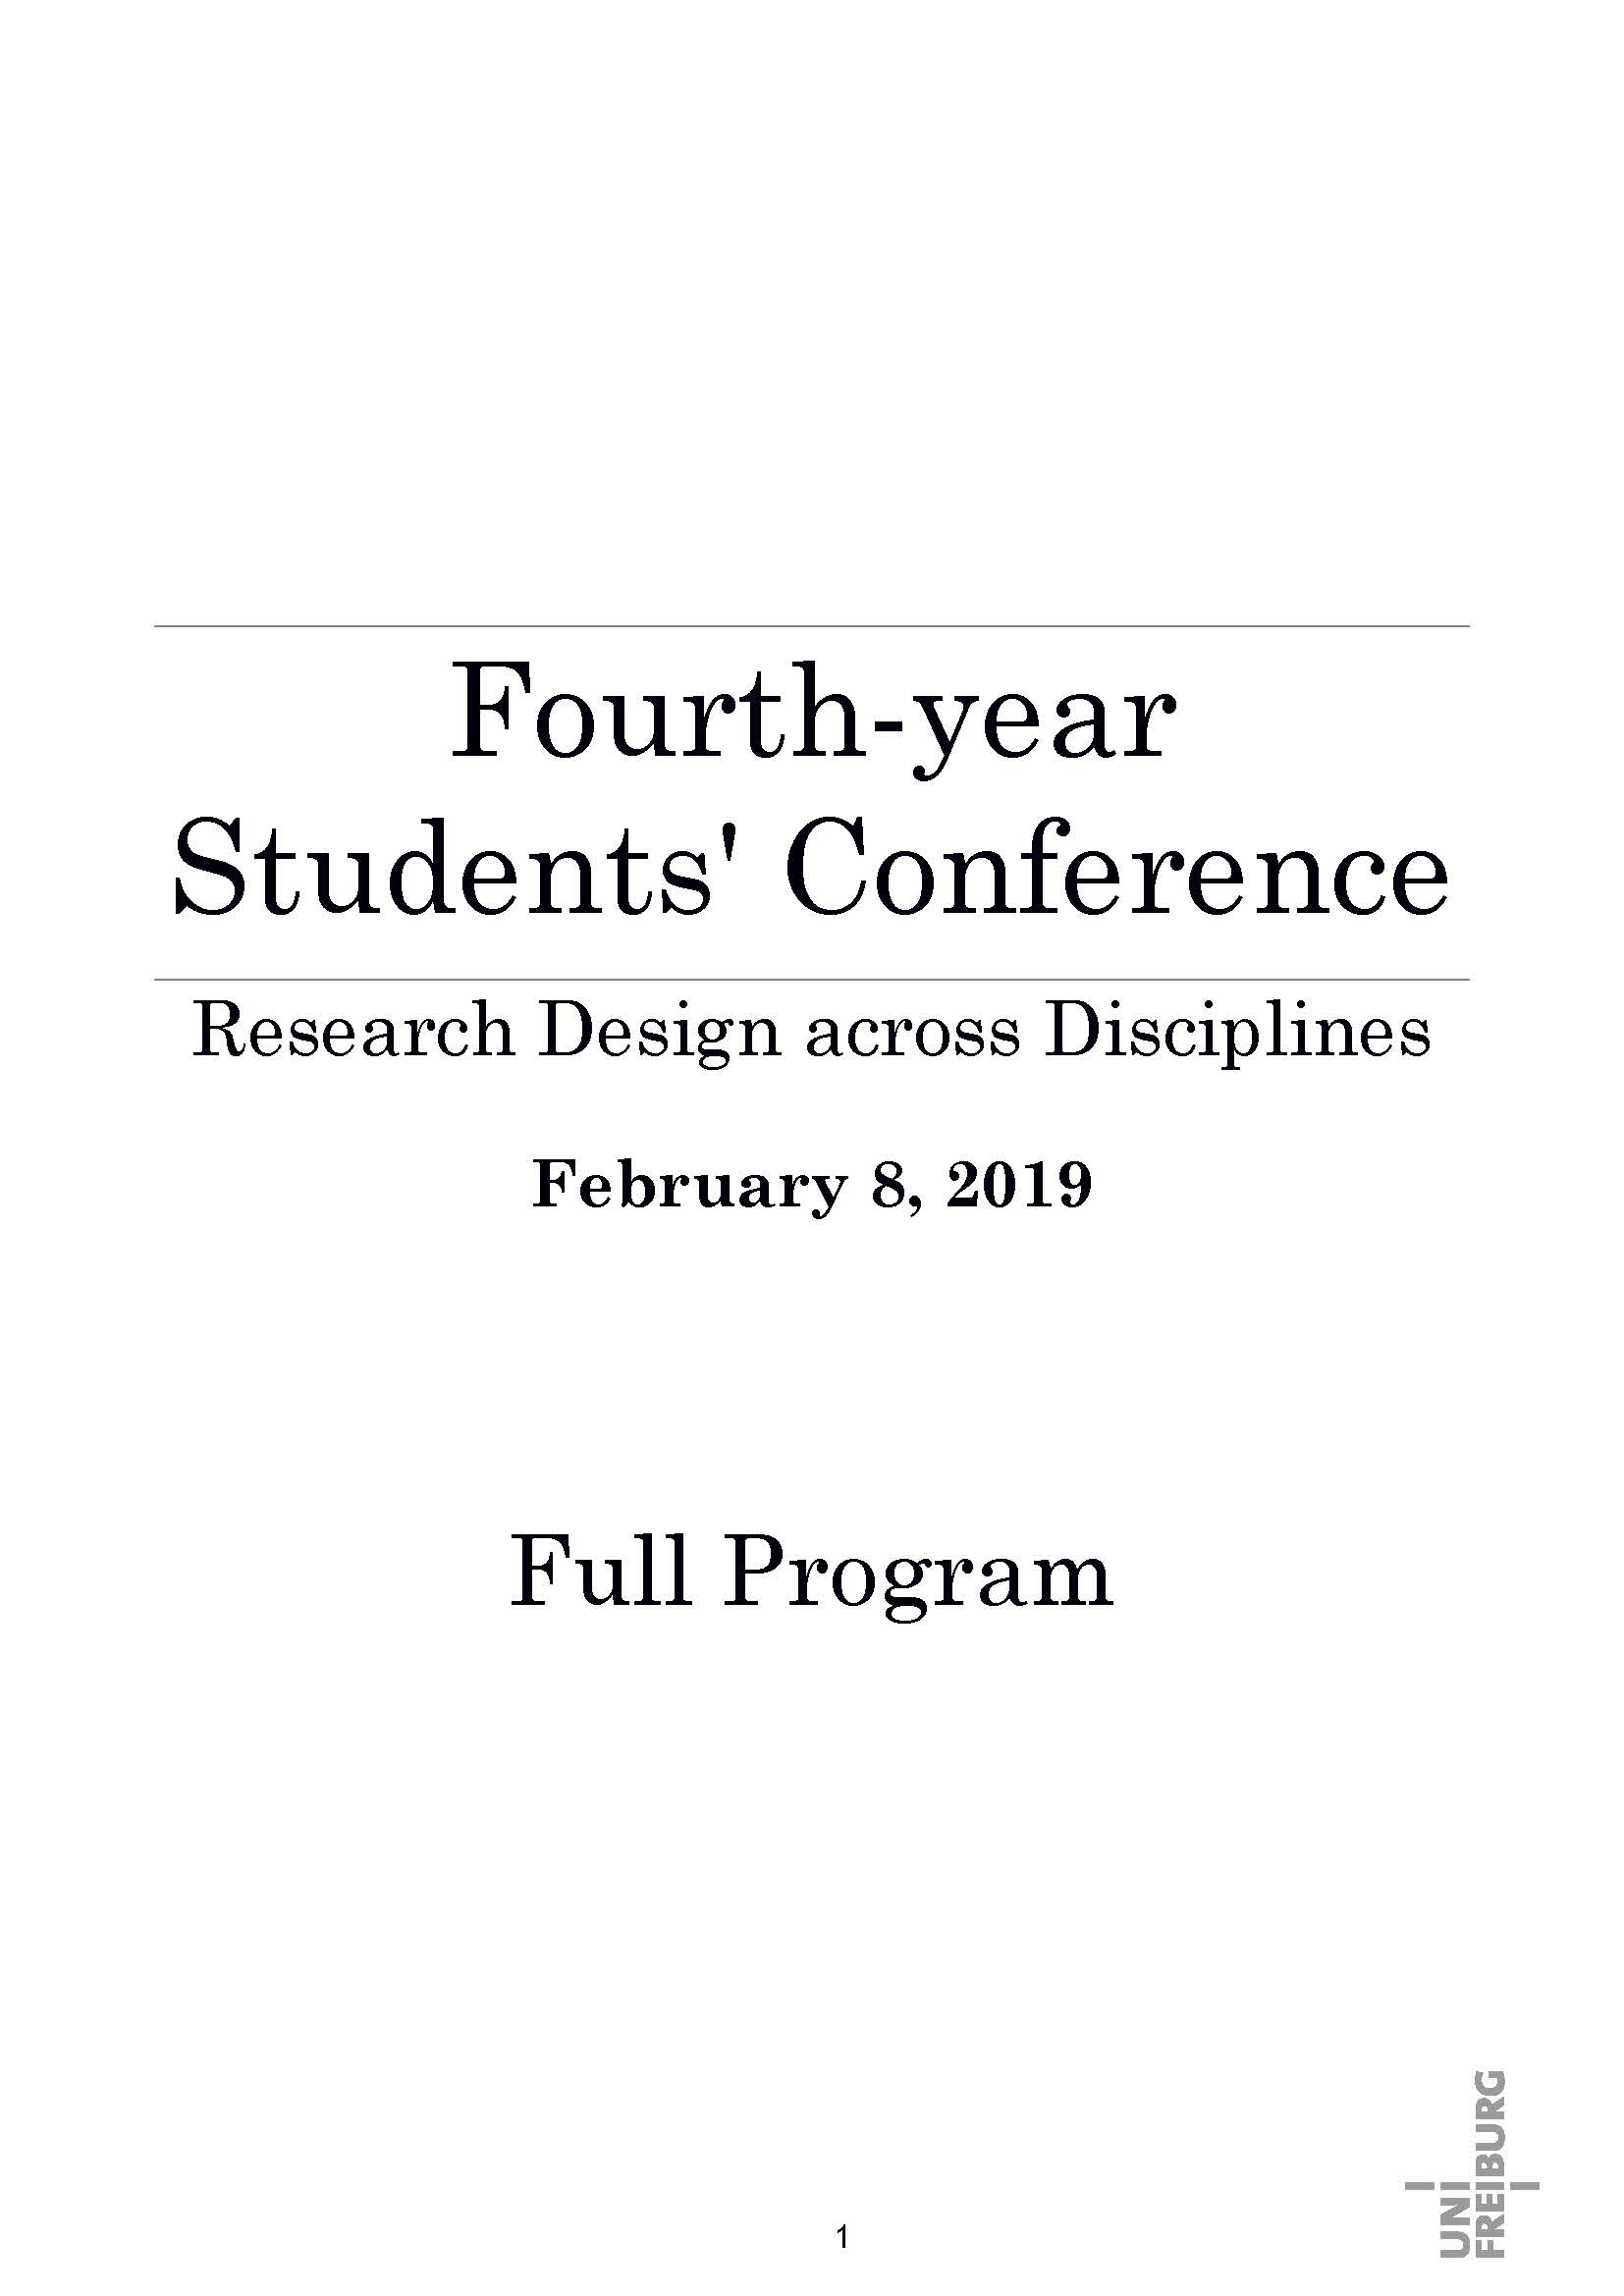 Programm Research across Disciplines